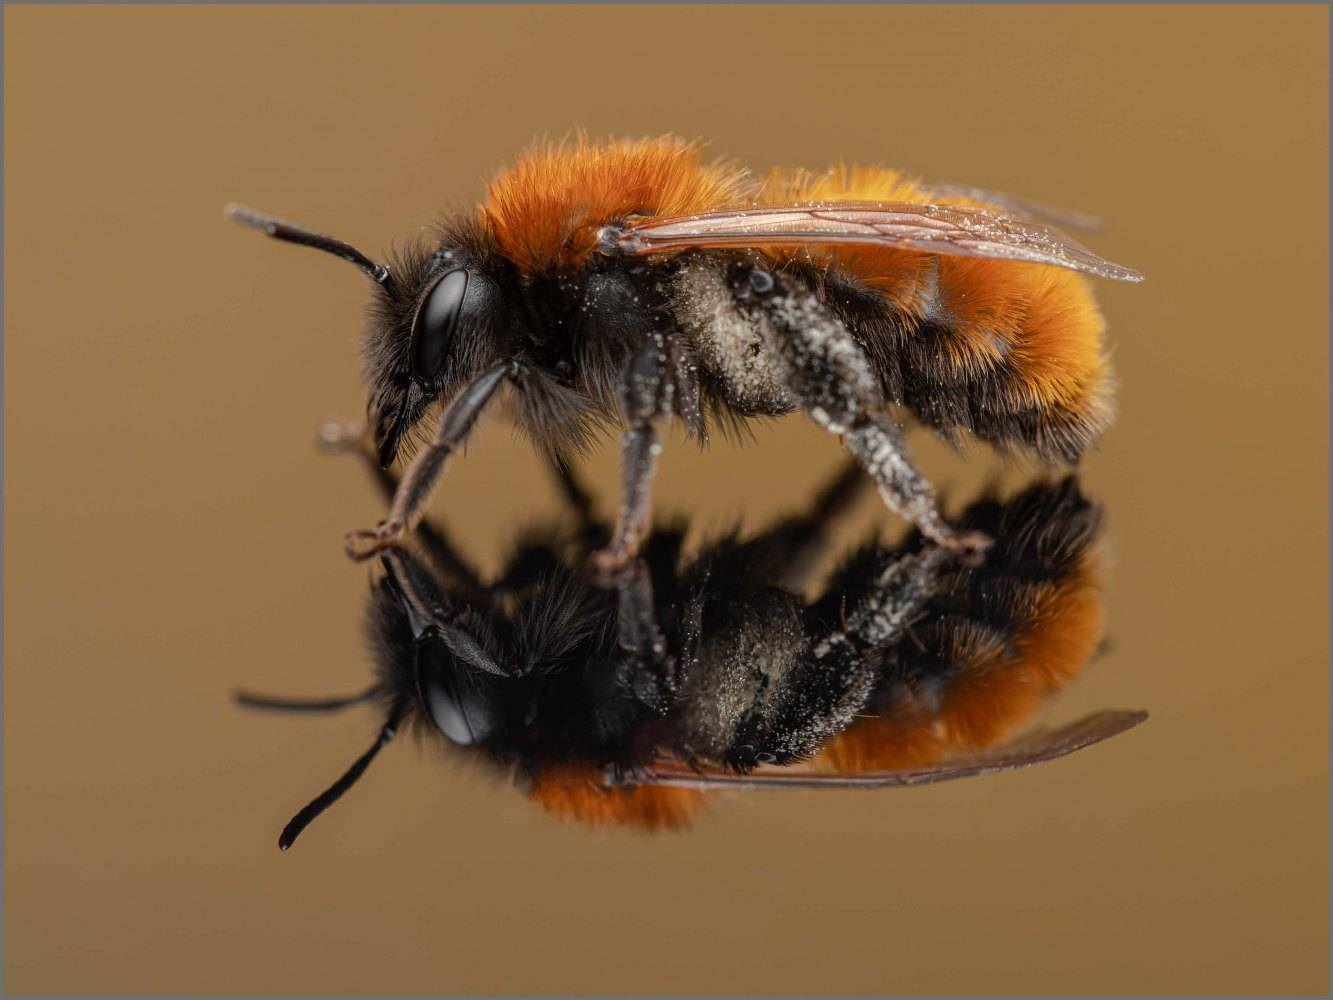 Andrena-fulva-female-Muller-1766-3